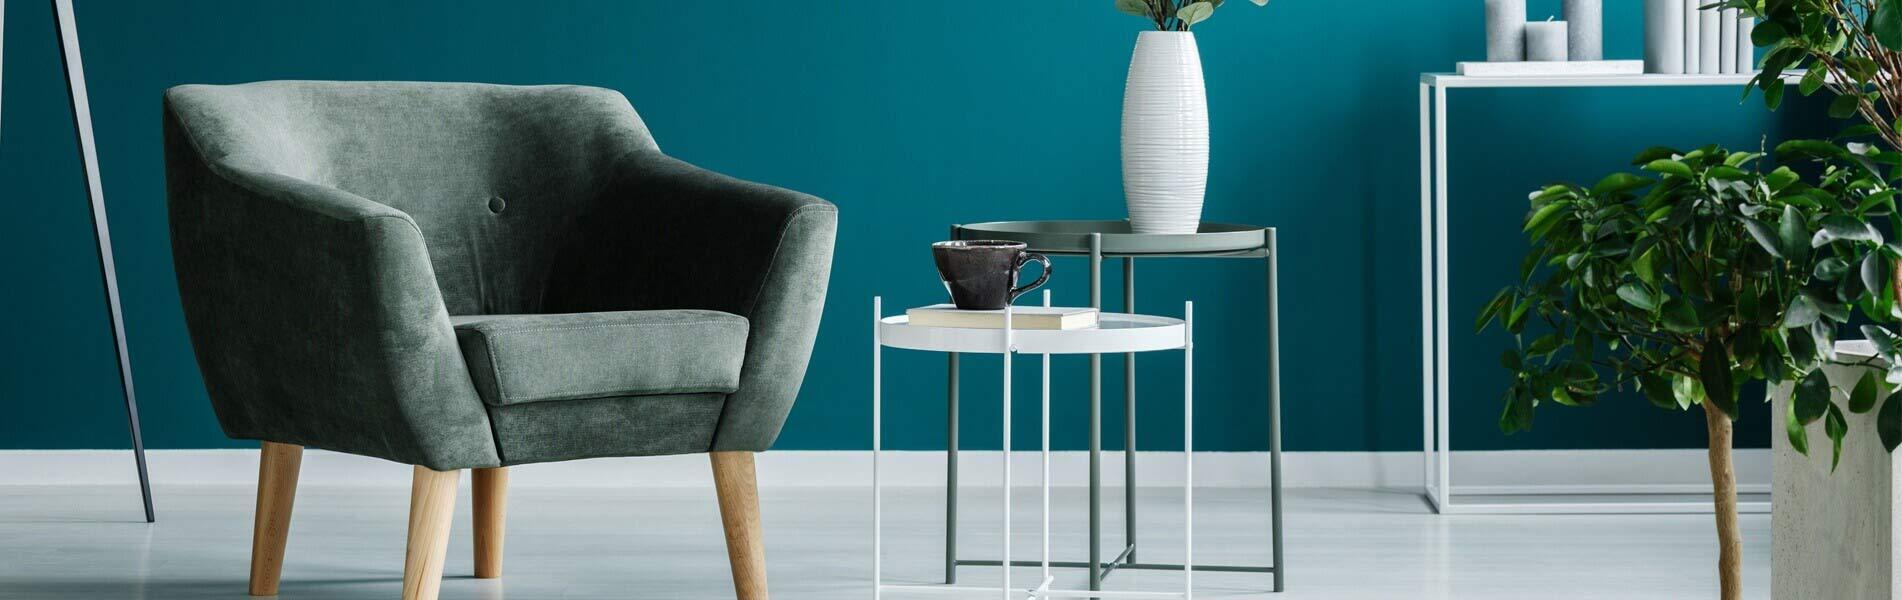 Furniture, Furnishing & Fittings